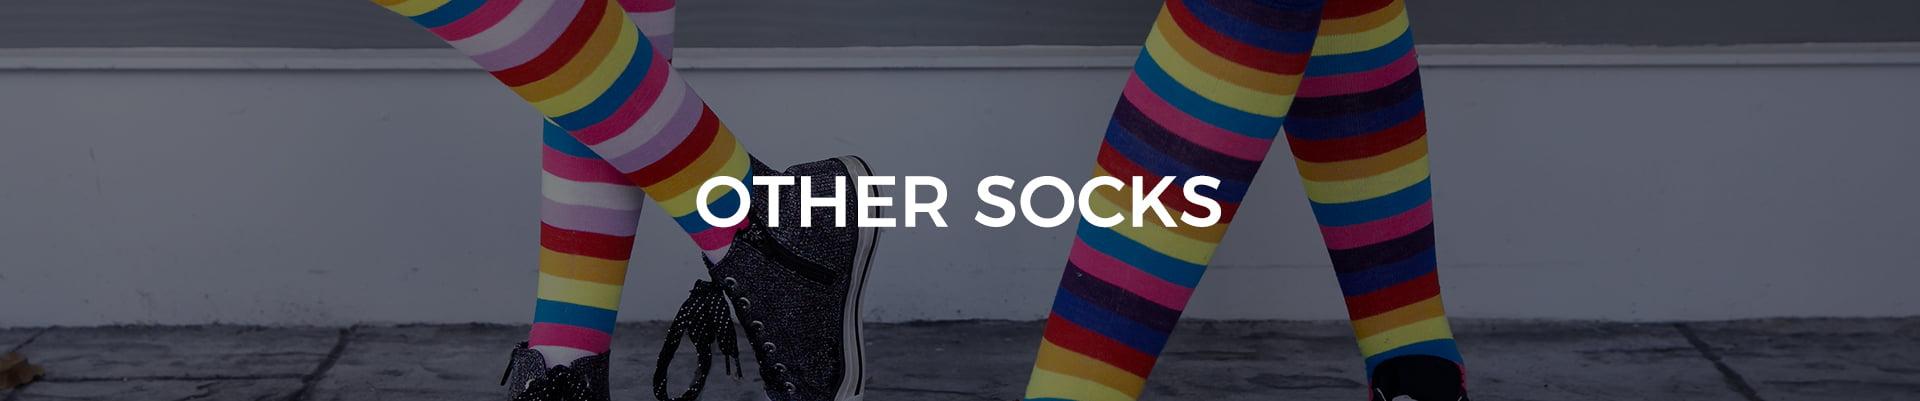 other socks